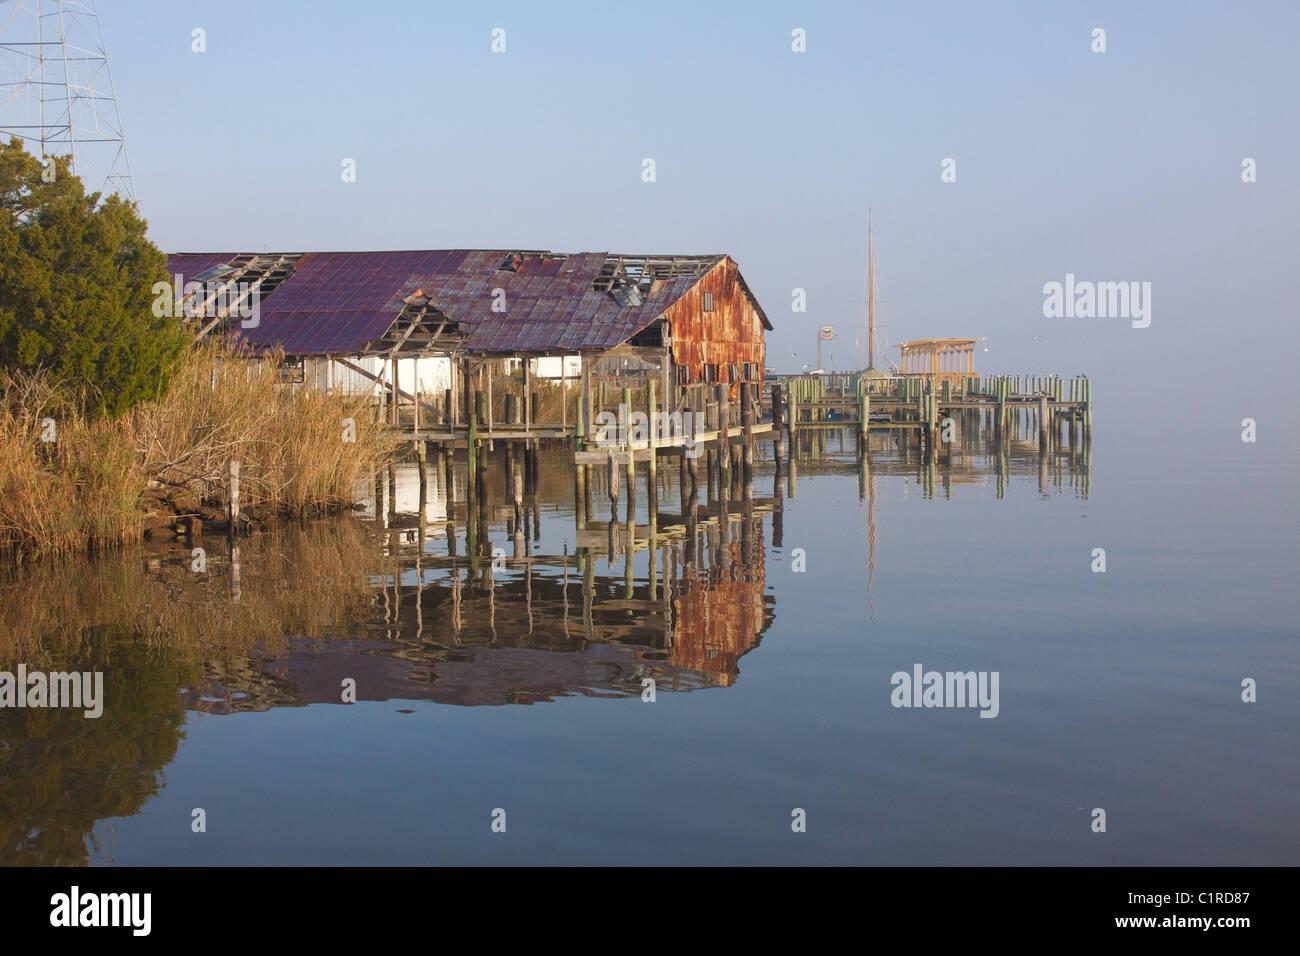 Abandoned wharf in Apalachicola, Florida, USA - Stock Image